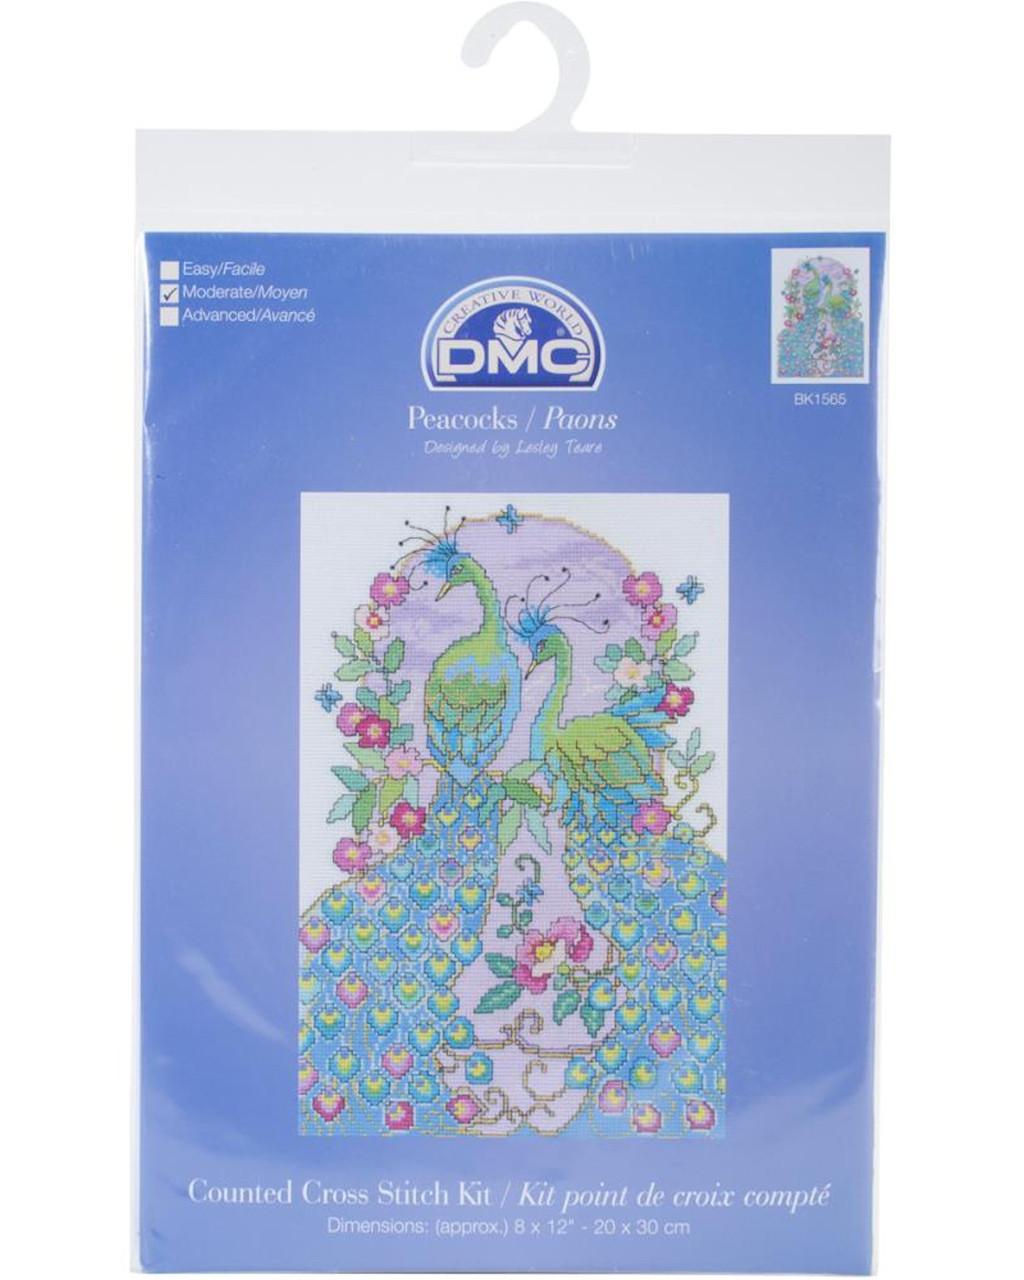 DMC - Peacocks